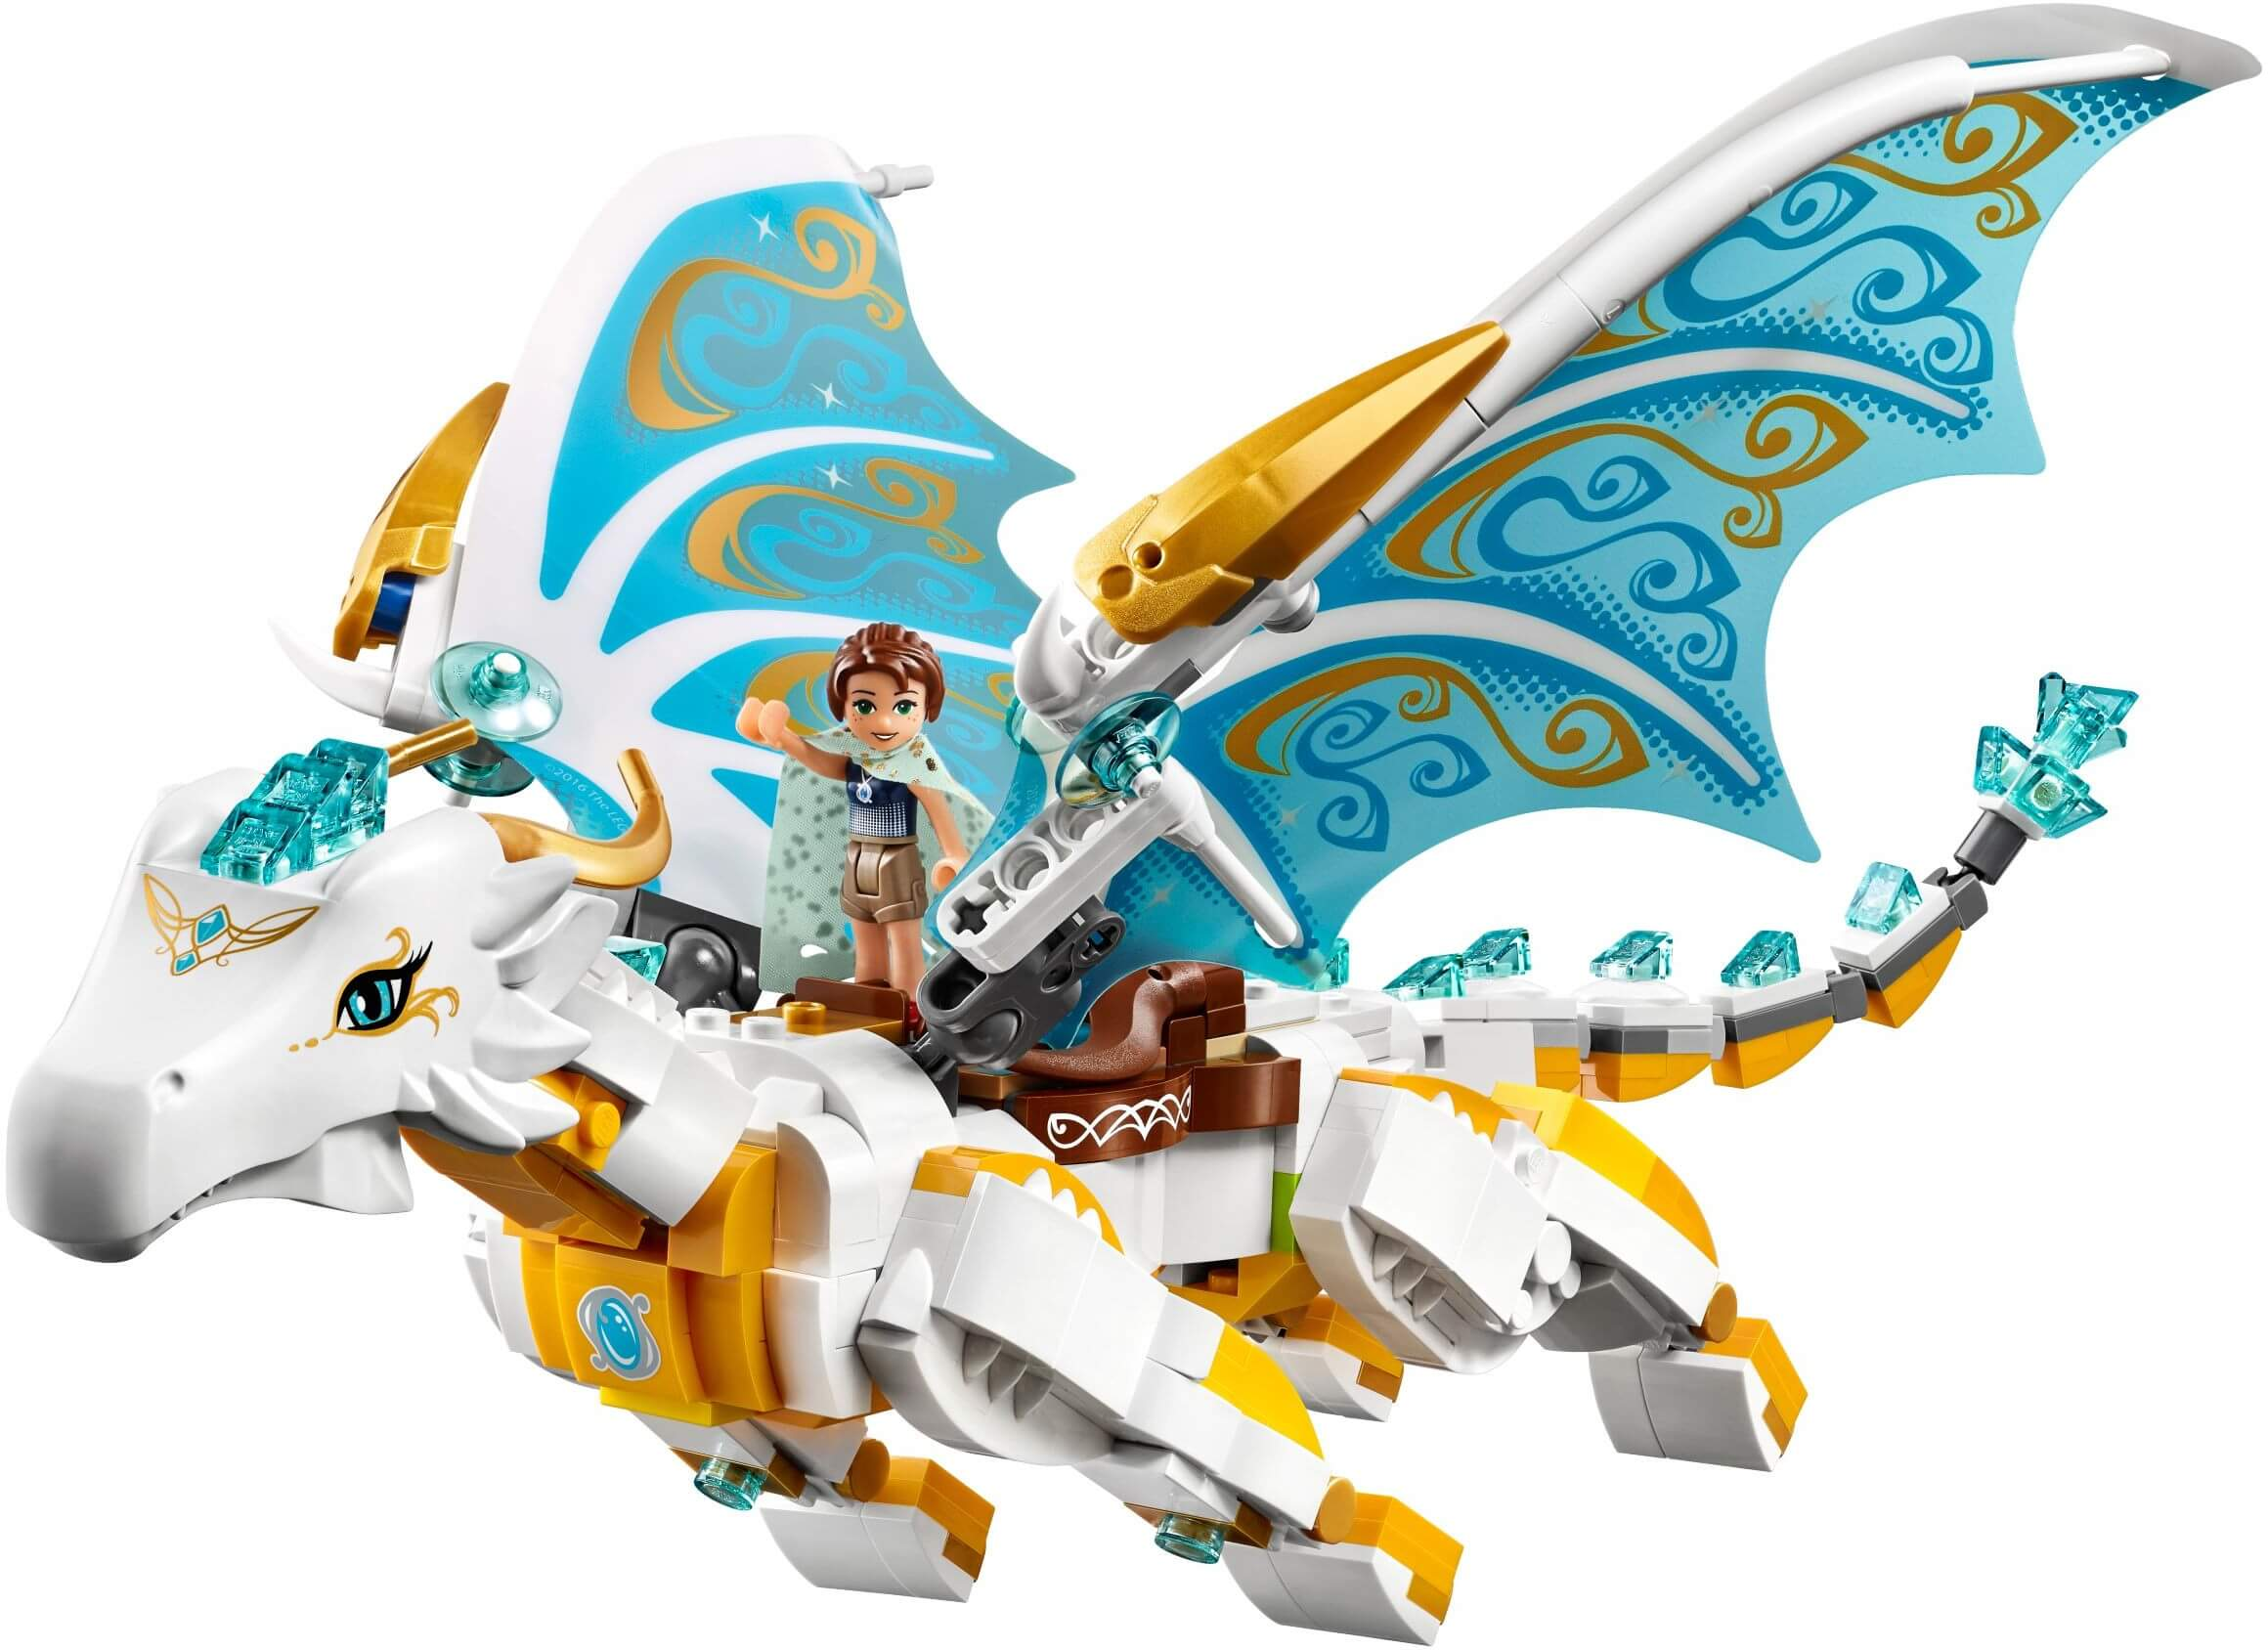 Mua đồ chơi LEGO 41179 - LEGO Elves 41179 - Cuộc Phiêu Lưu Giải Cứu Rồng Mẹ (LEGO Elves Queen Dragon's Rescue 41179)